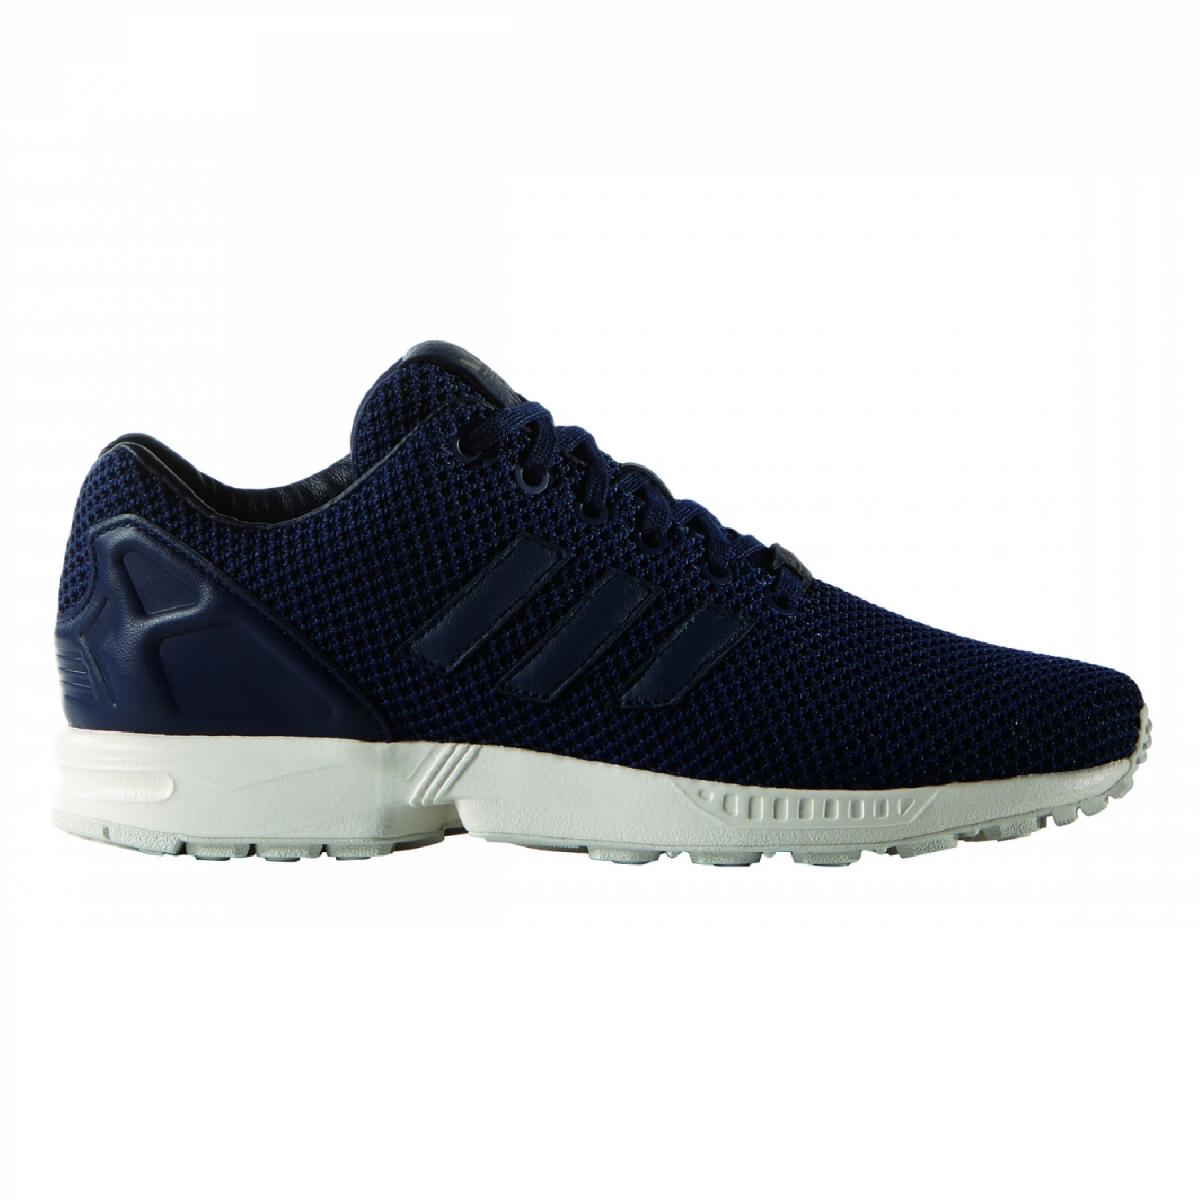 adidas originals zx flux herren sneaker dunkelblau s79088 sport klingenmaier. Black Bedroom Furniture Sets. Home Design Ideas